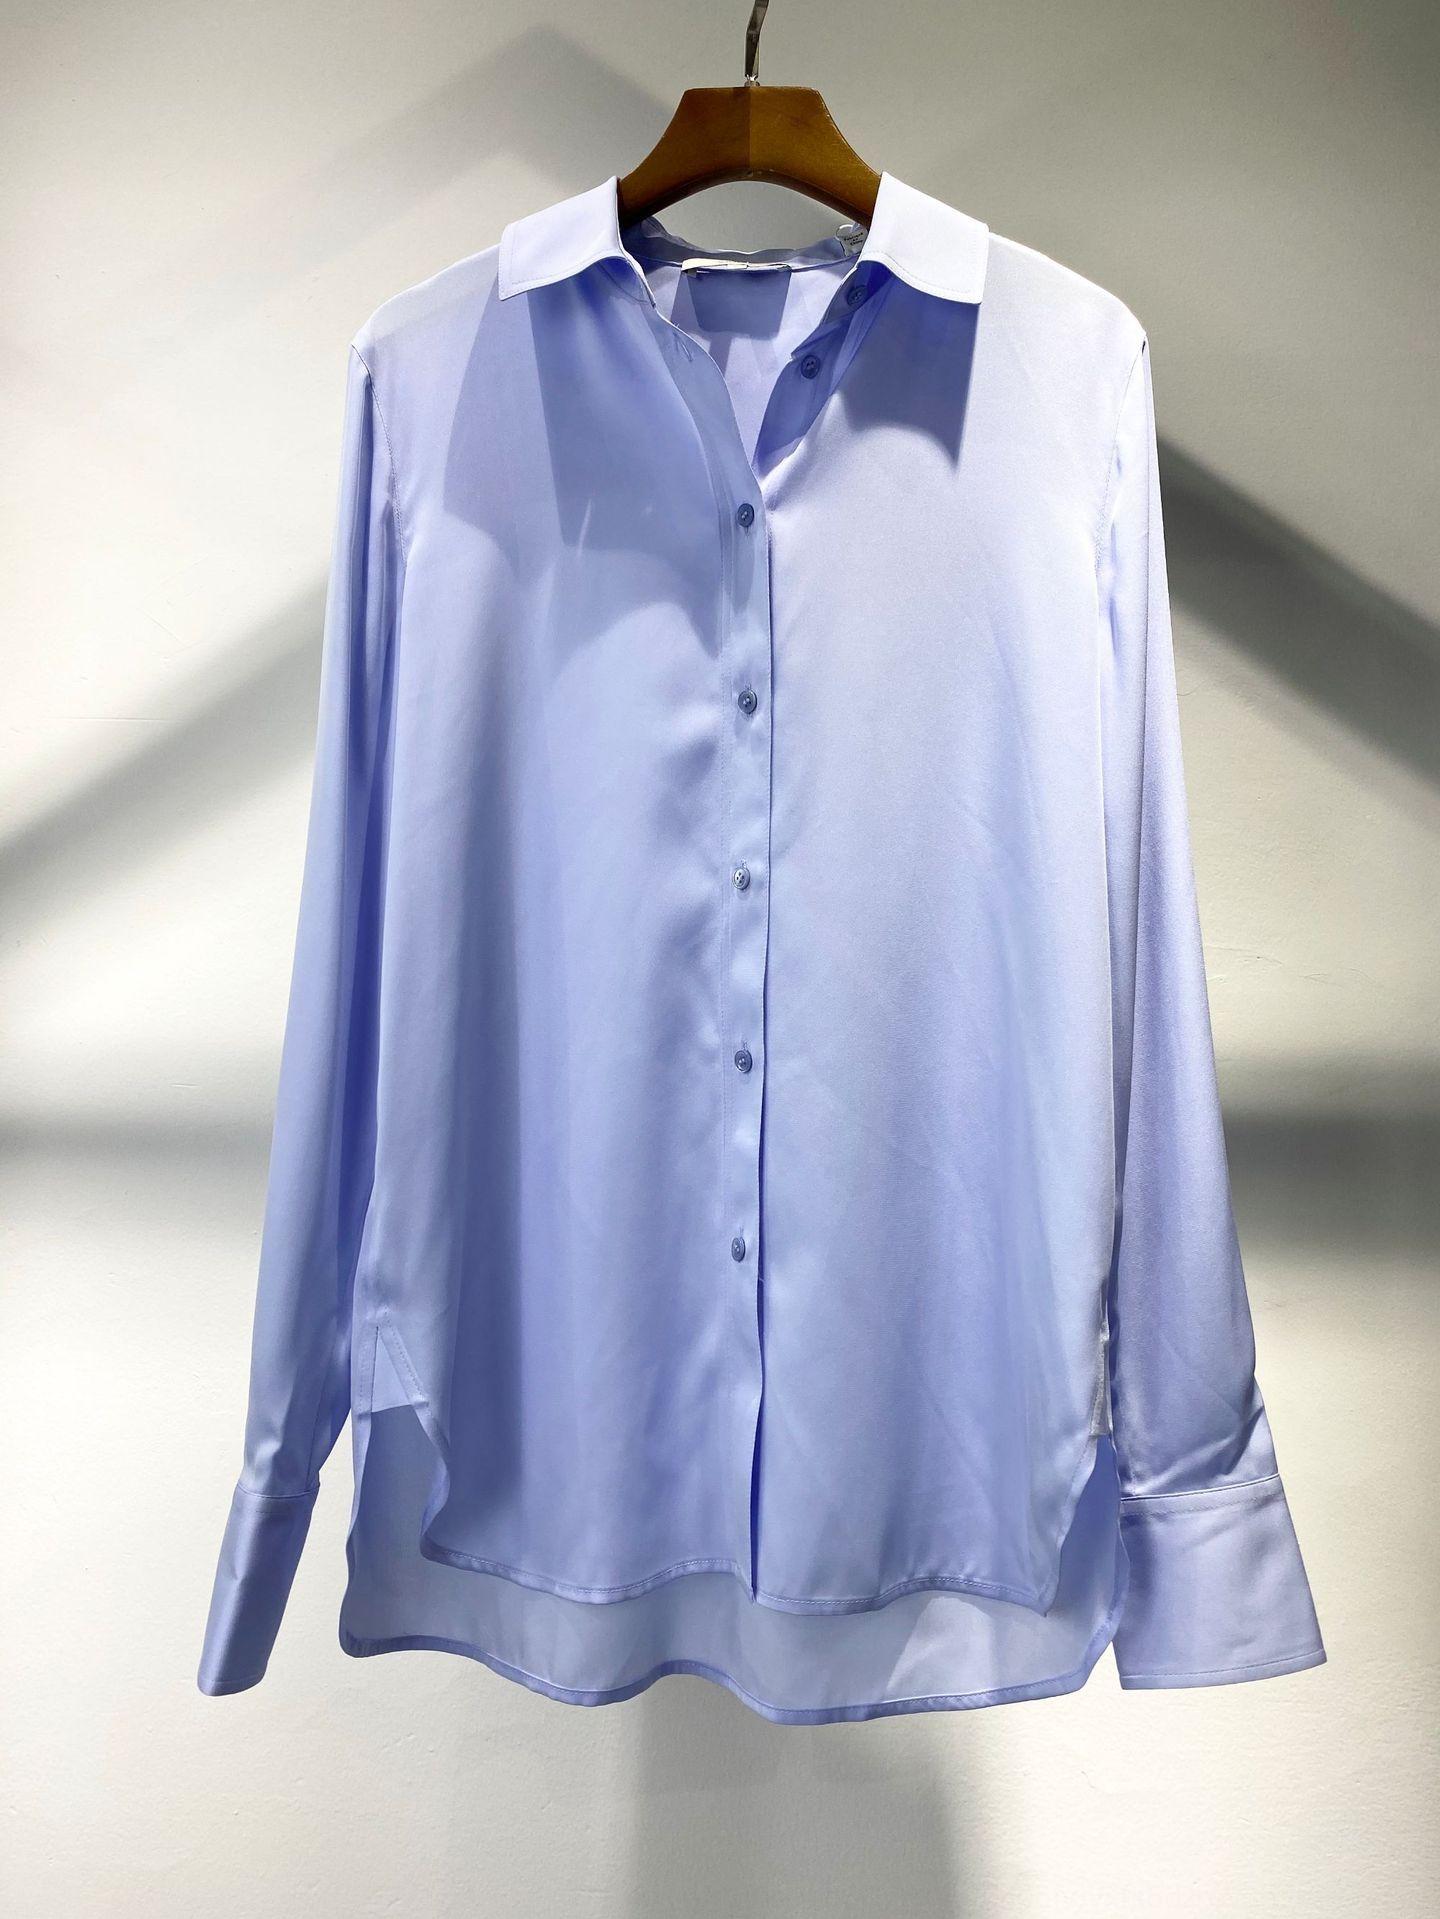 a camisa das mulheres novo kaRh0 top verão Vin Top Silk camisa mulheres casuais verão temperamento seda